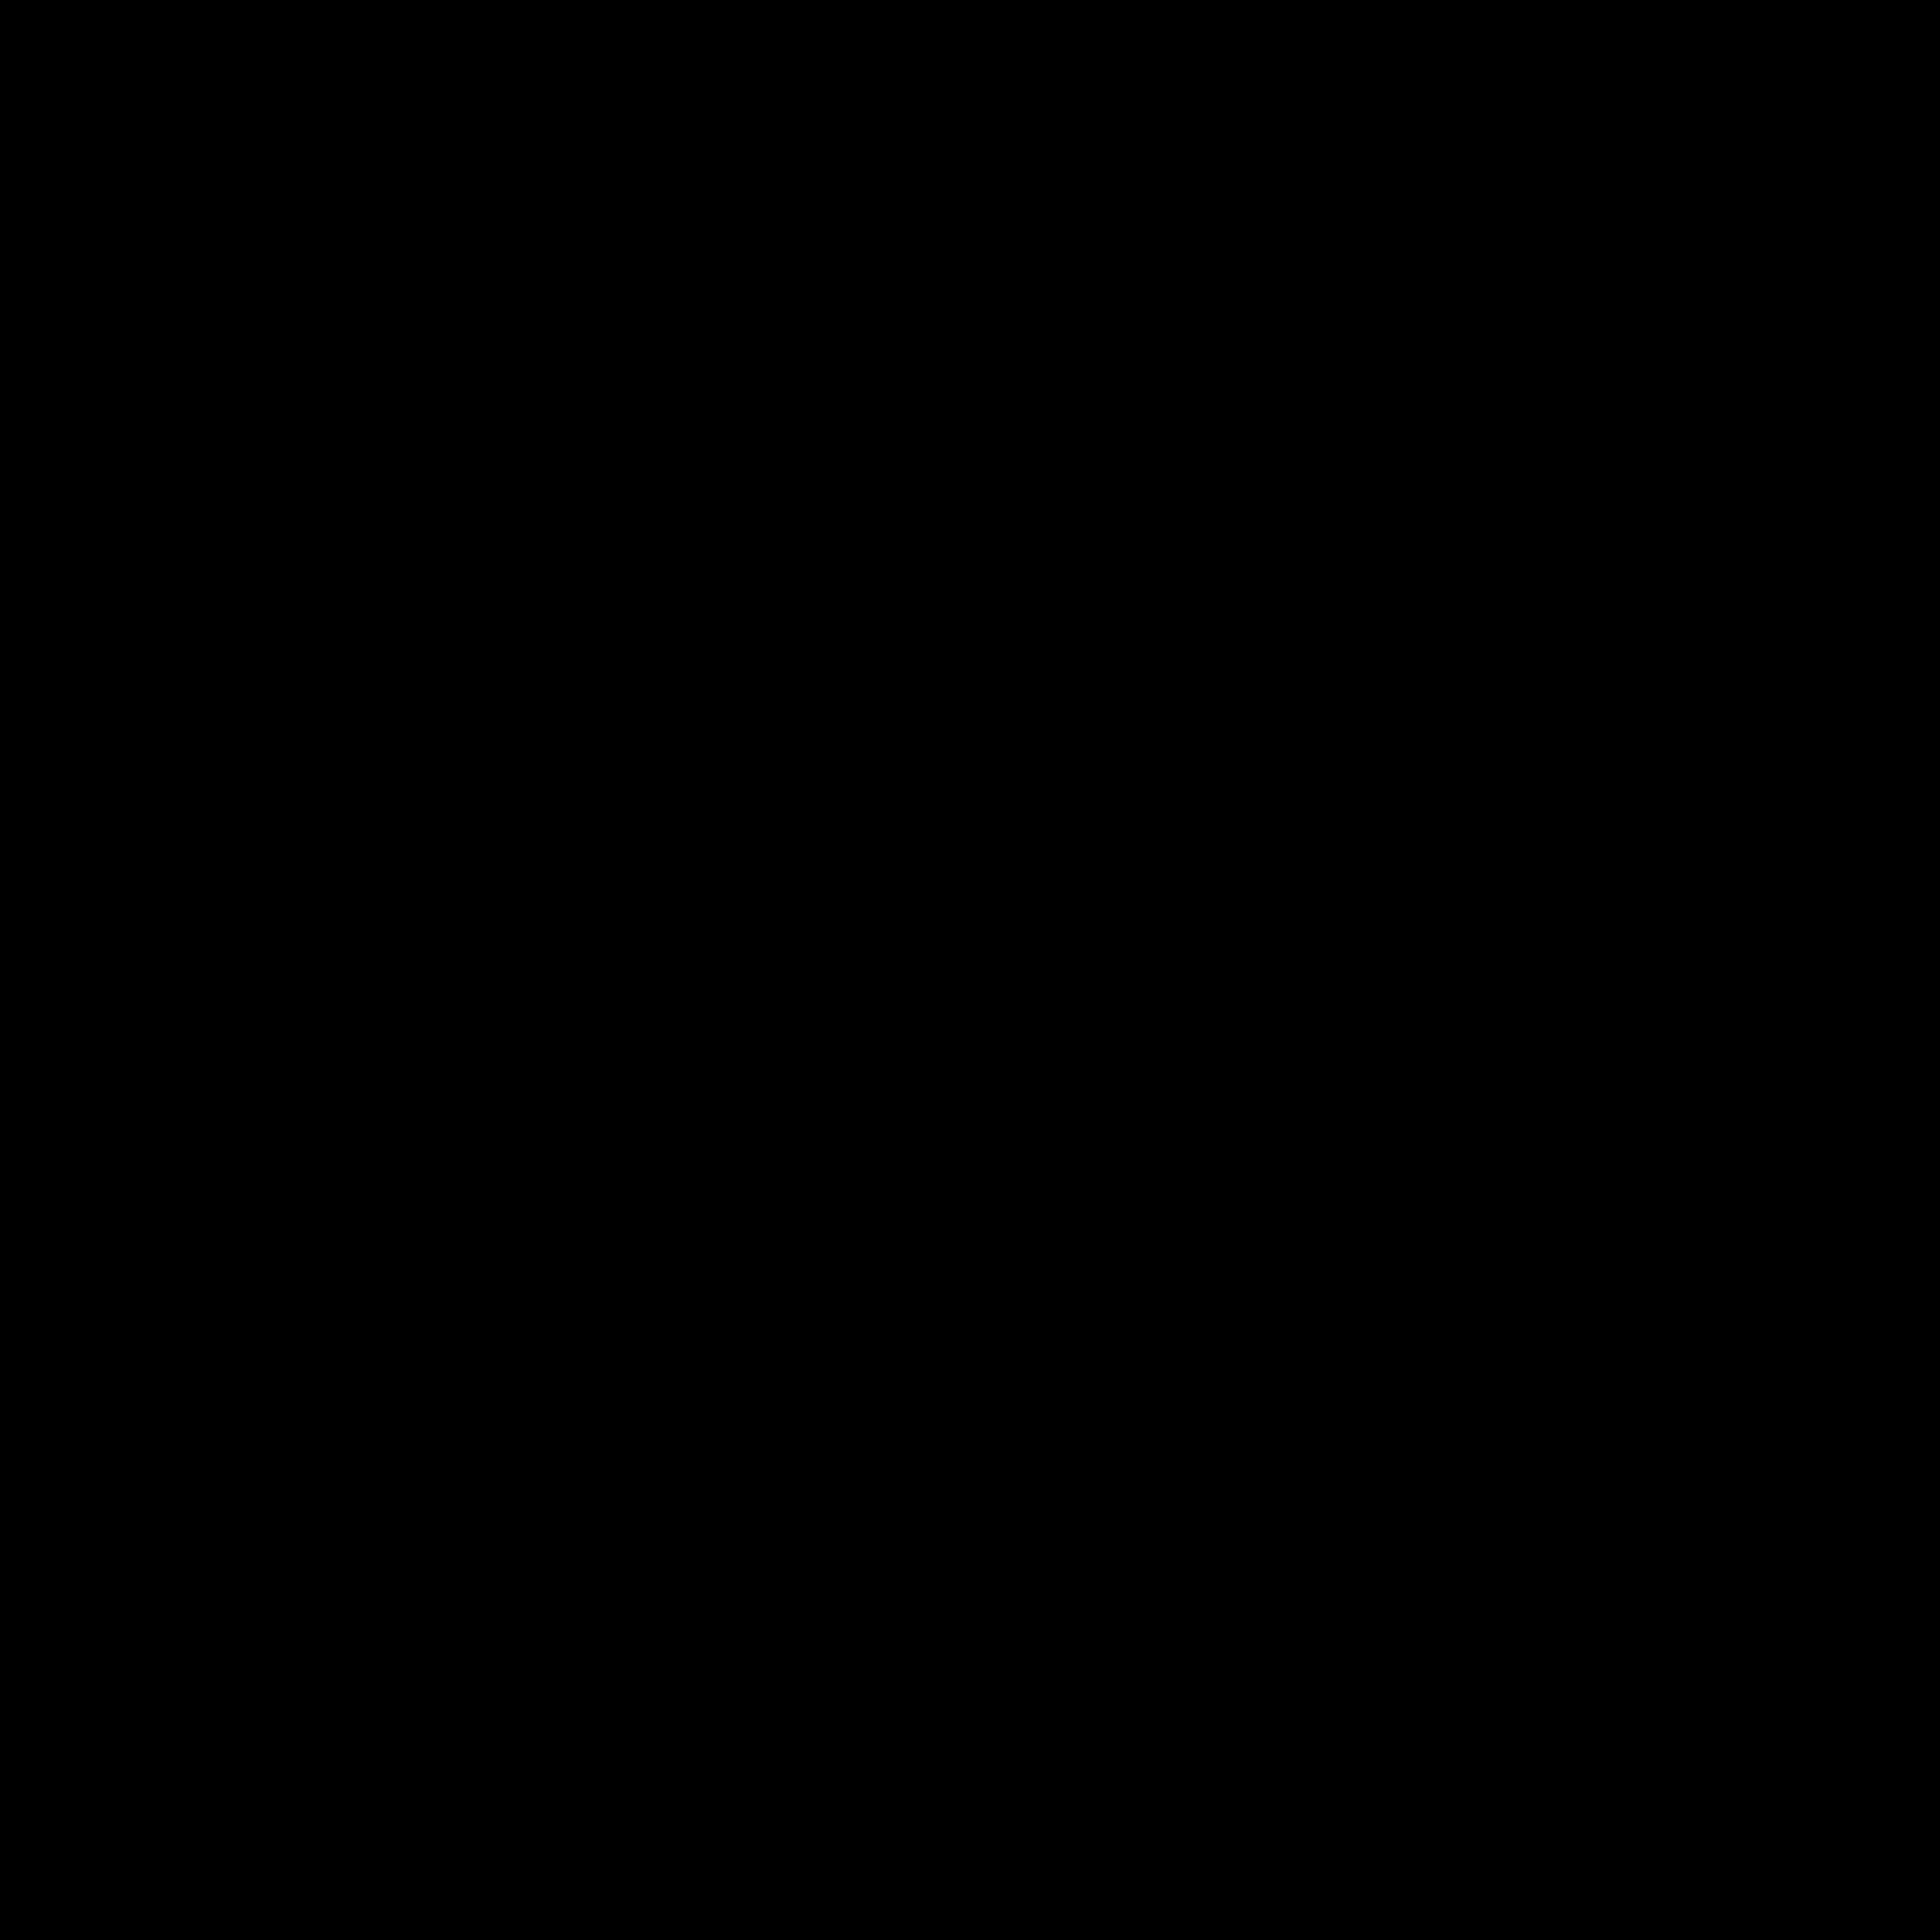 clip stock Full Service Bank Logo PNG Transparent